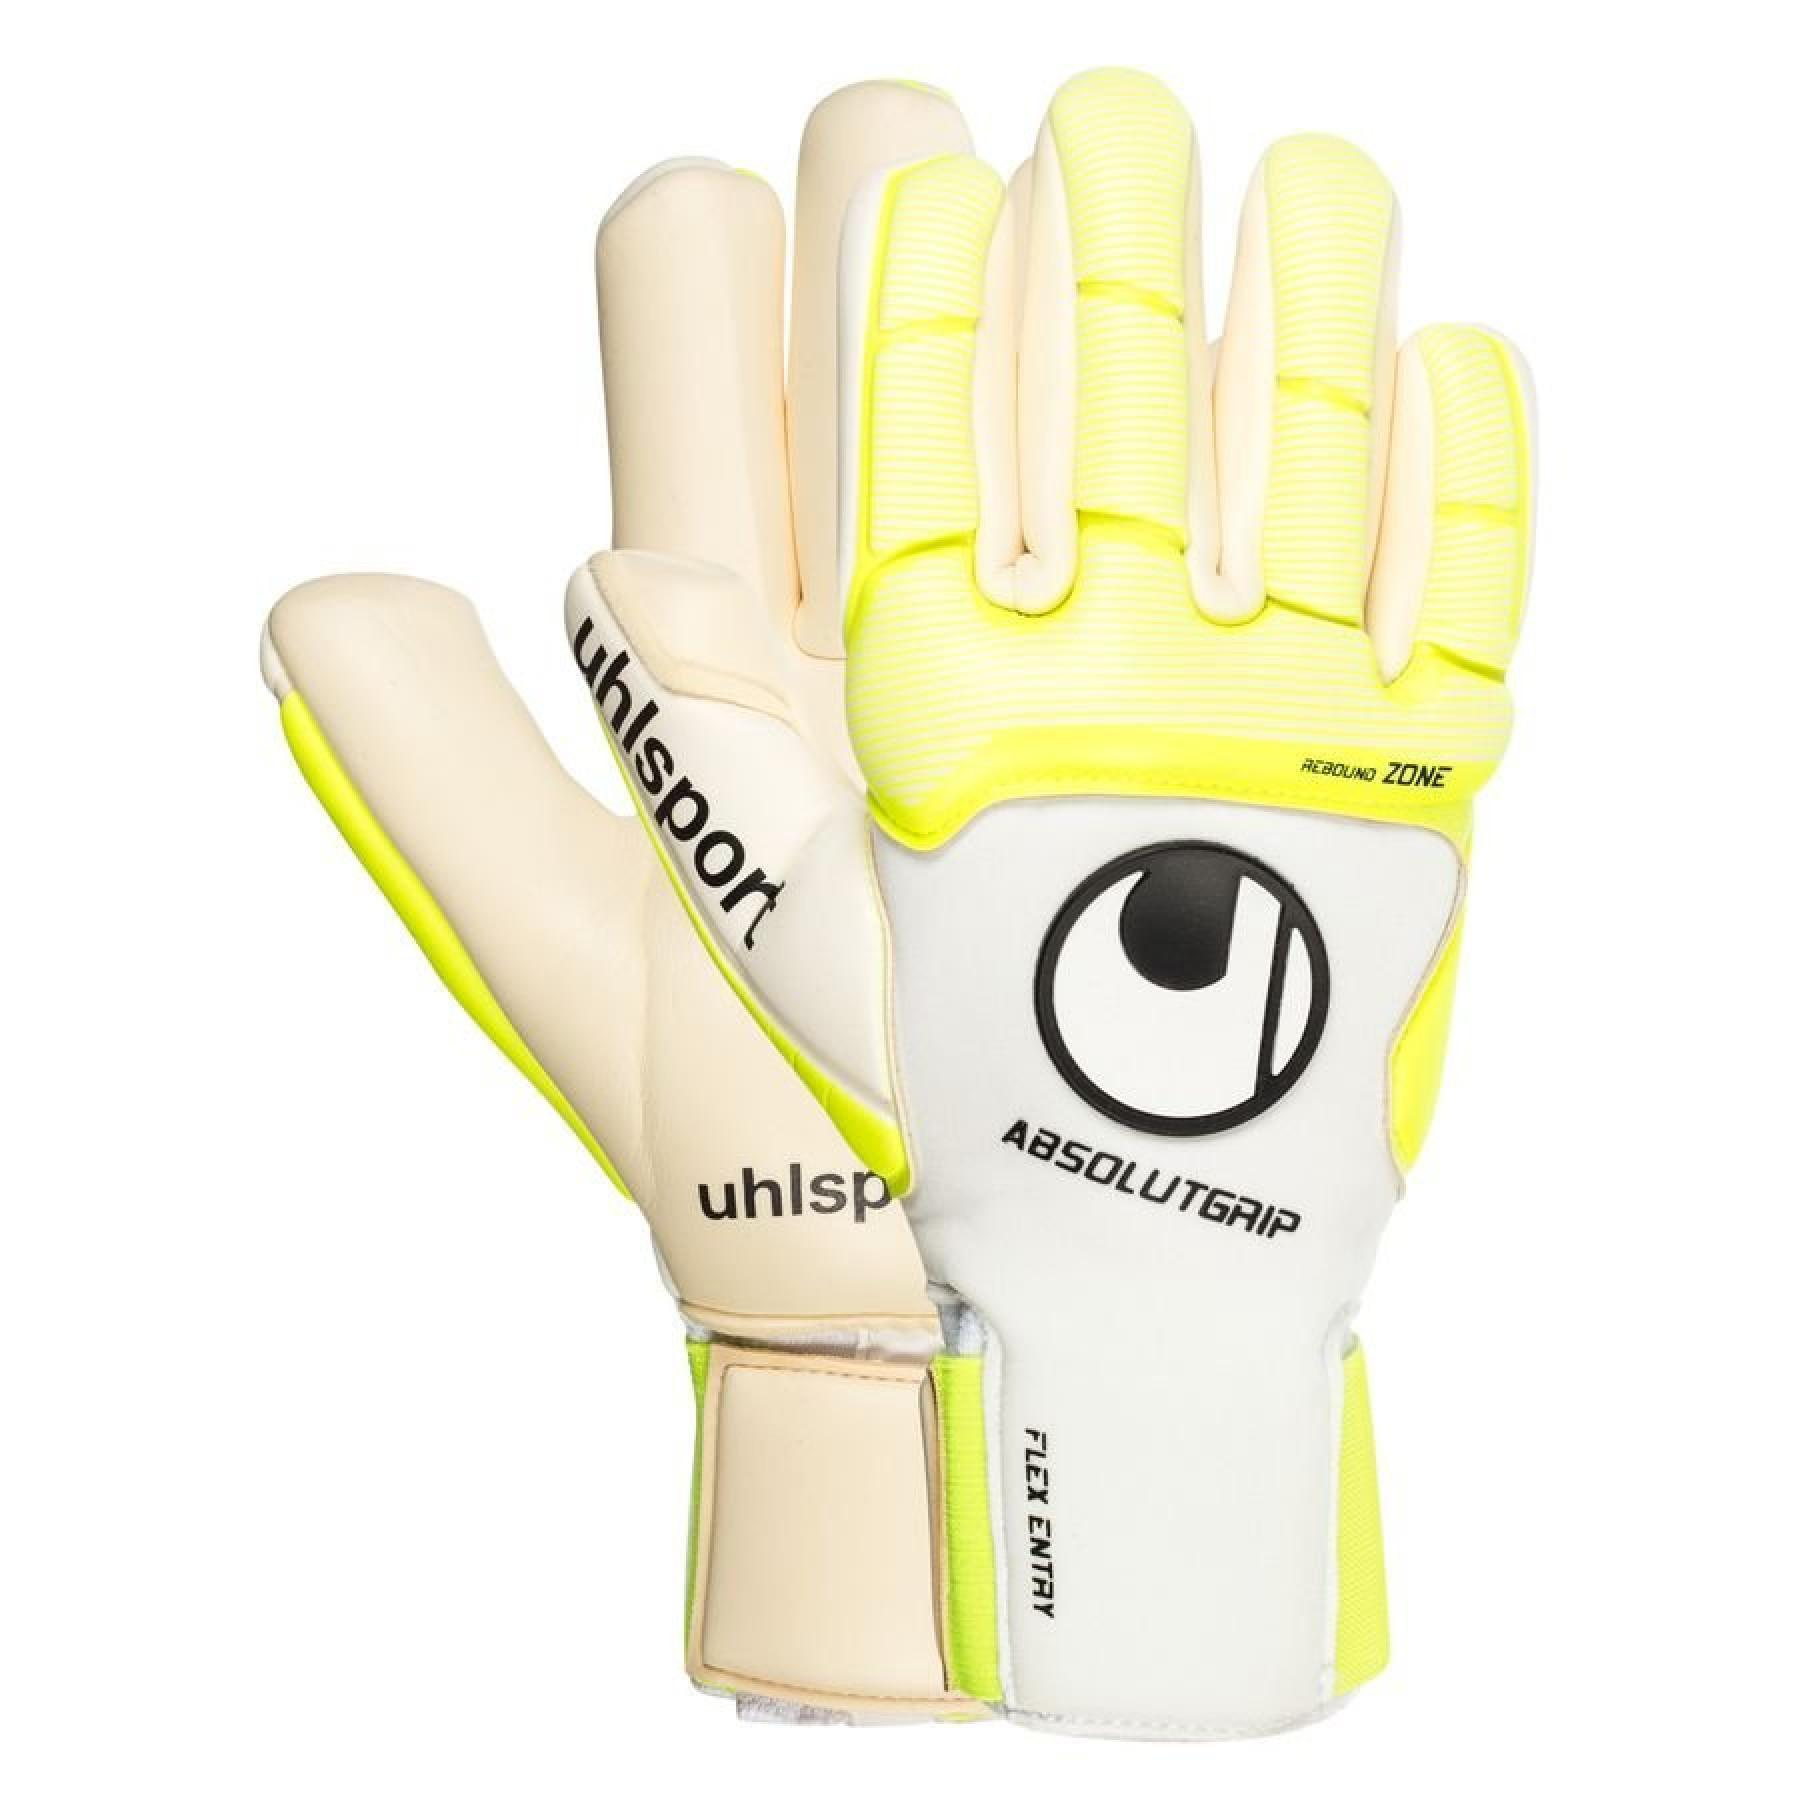 Uhlsport Gloves Pure Alliance Absolutgrip Finger Surround